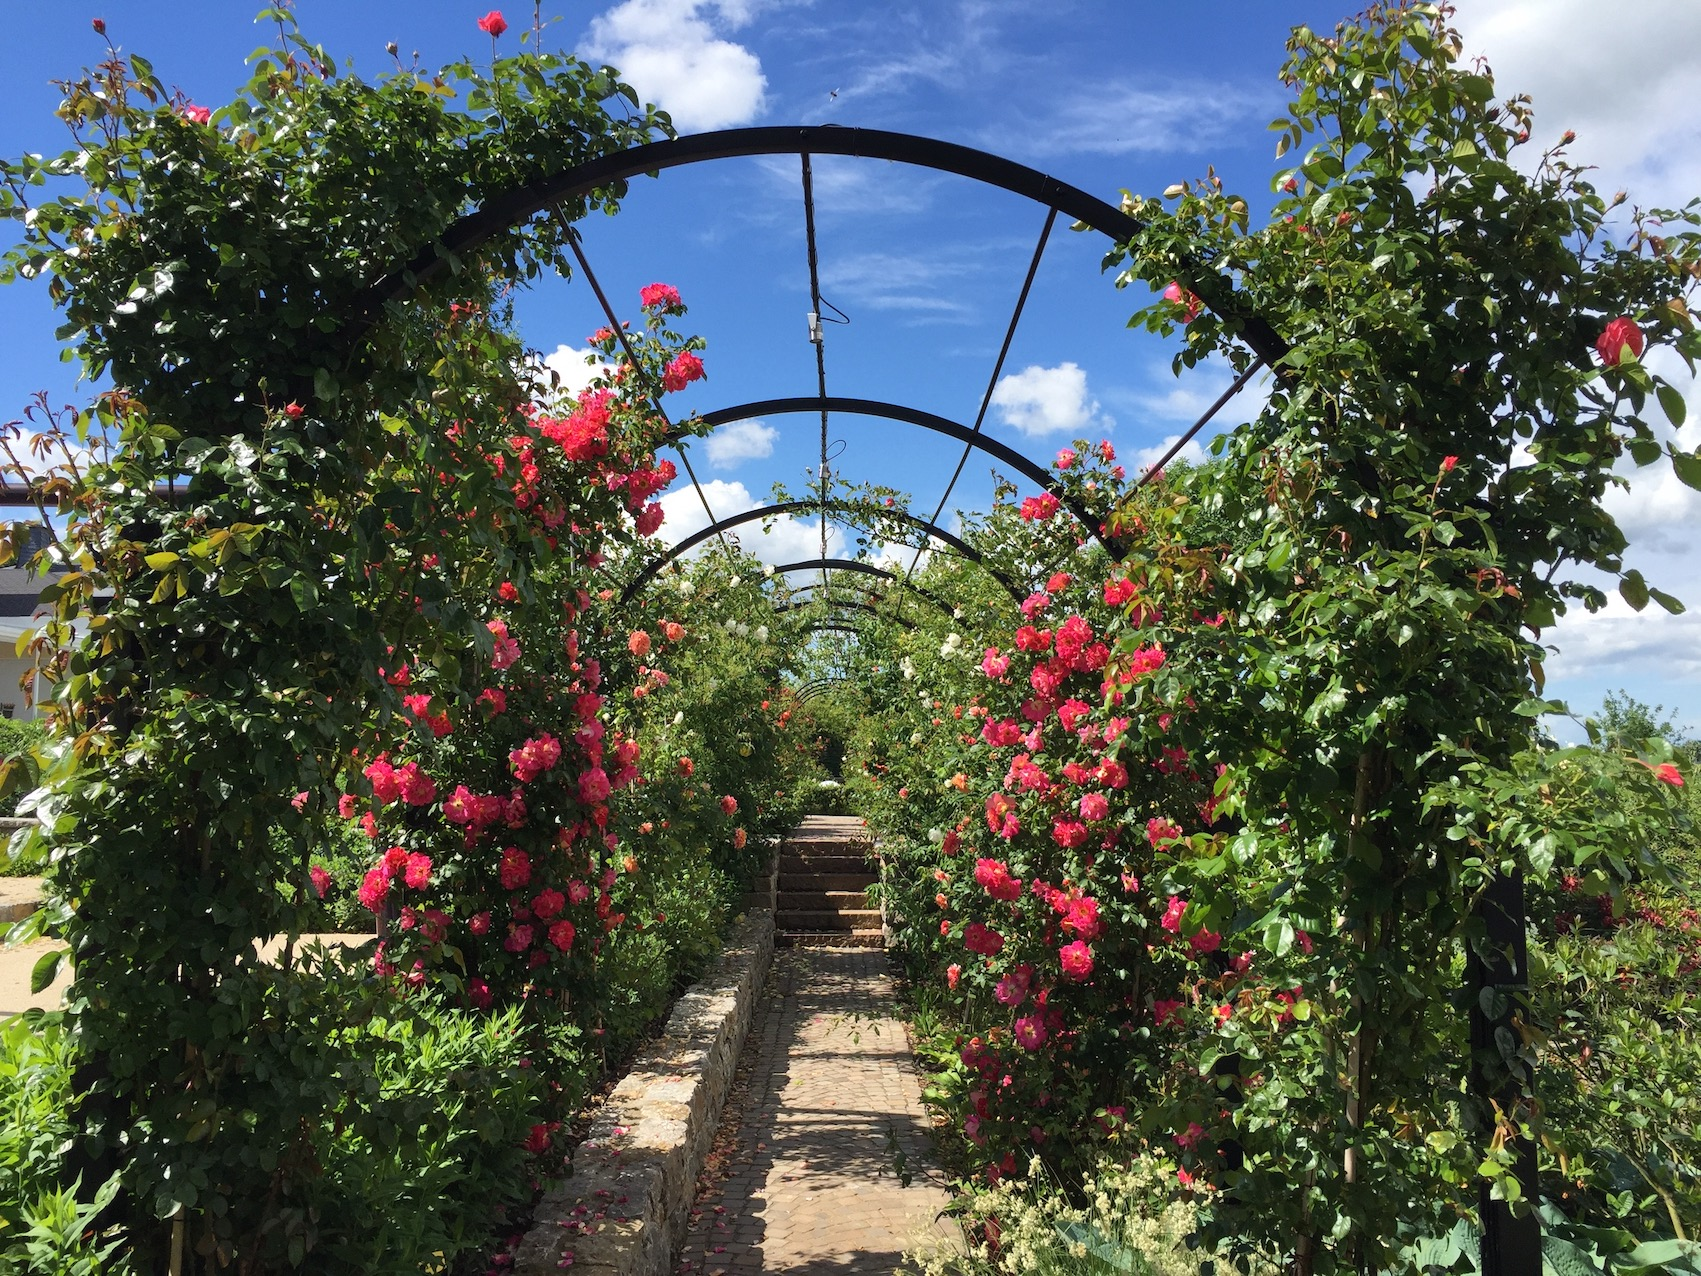 Laubengang Metall Rote Rosen noch nicht bewachsen